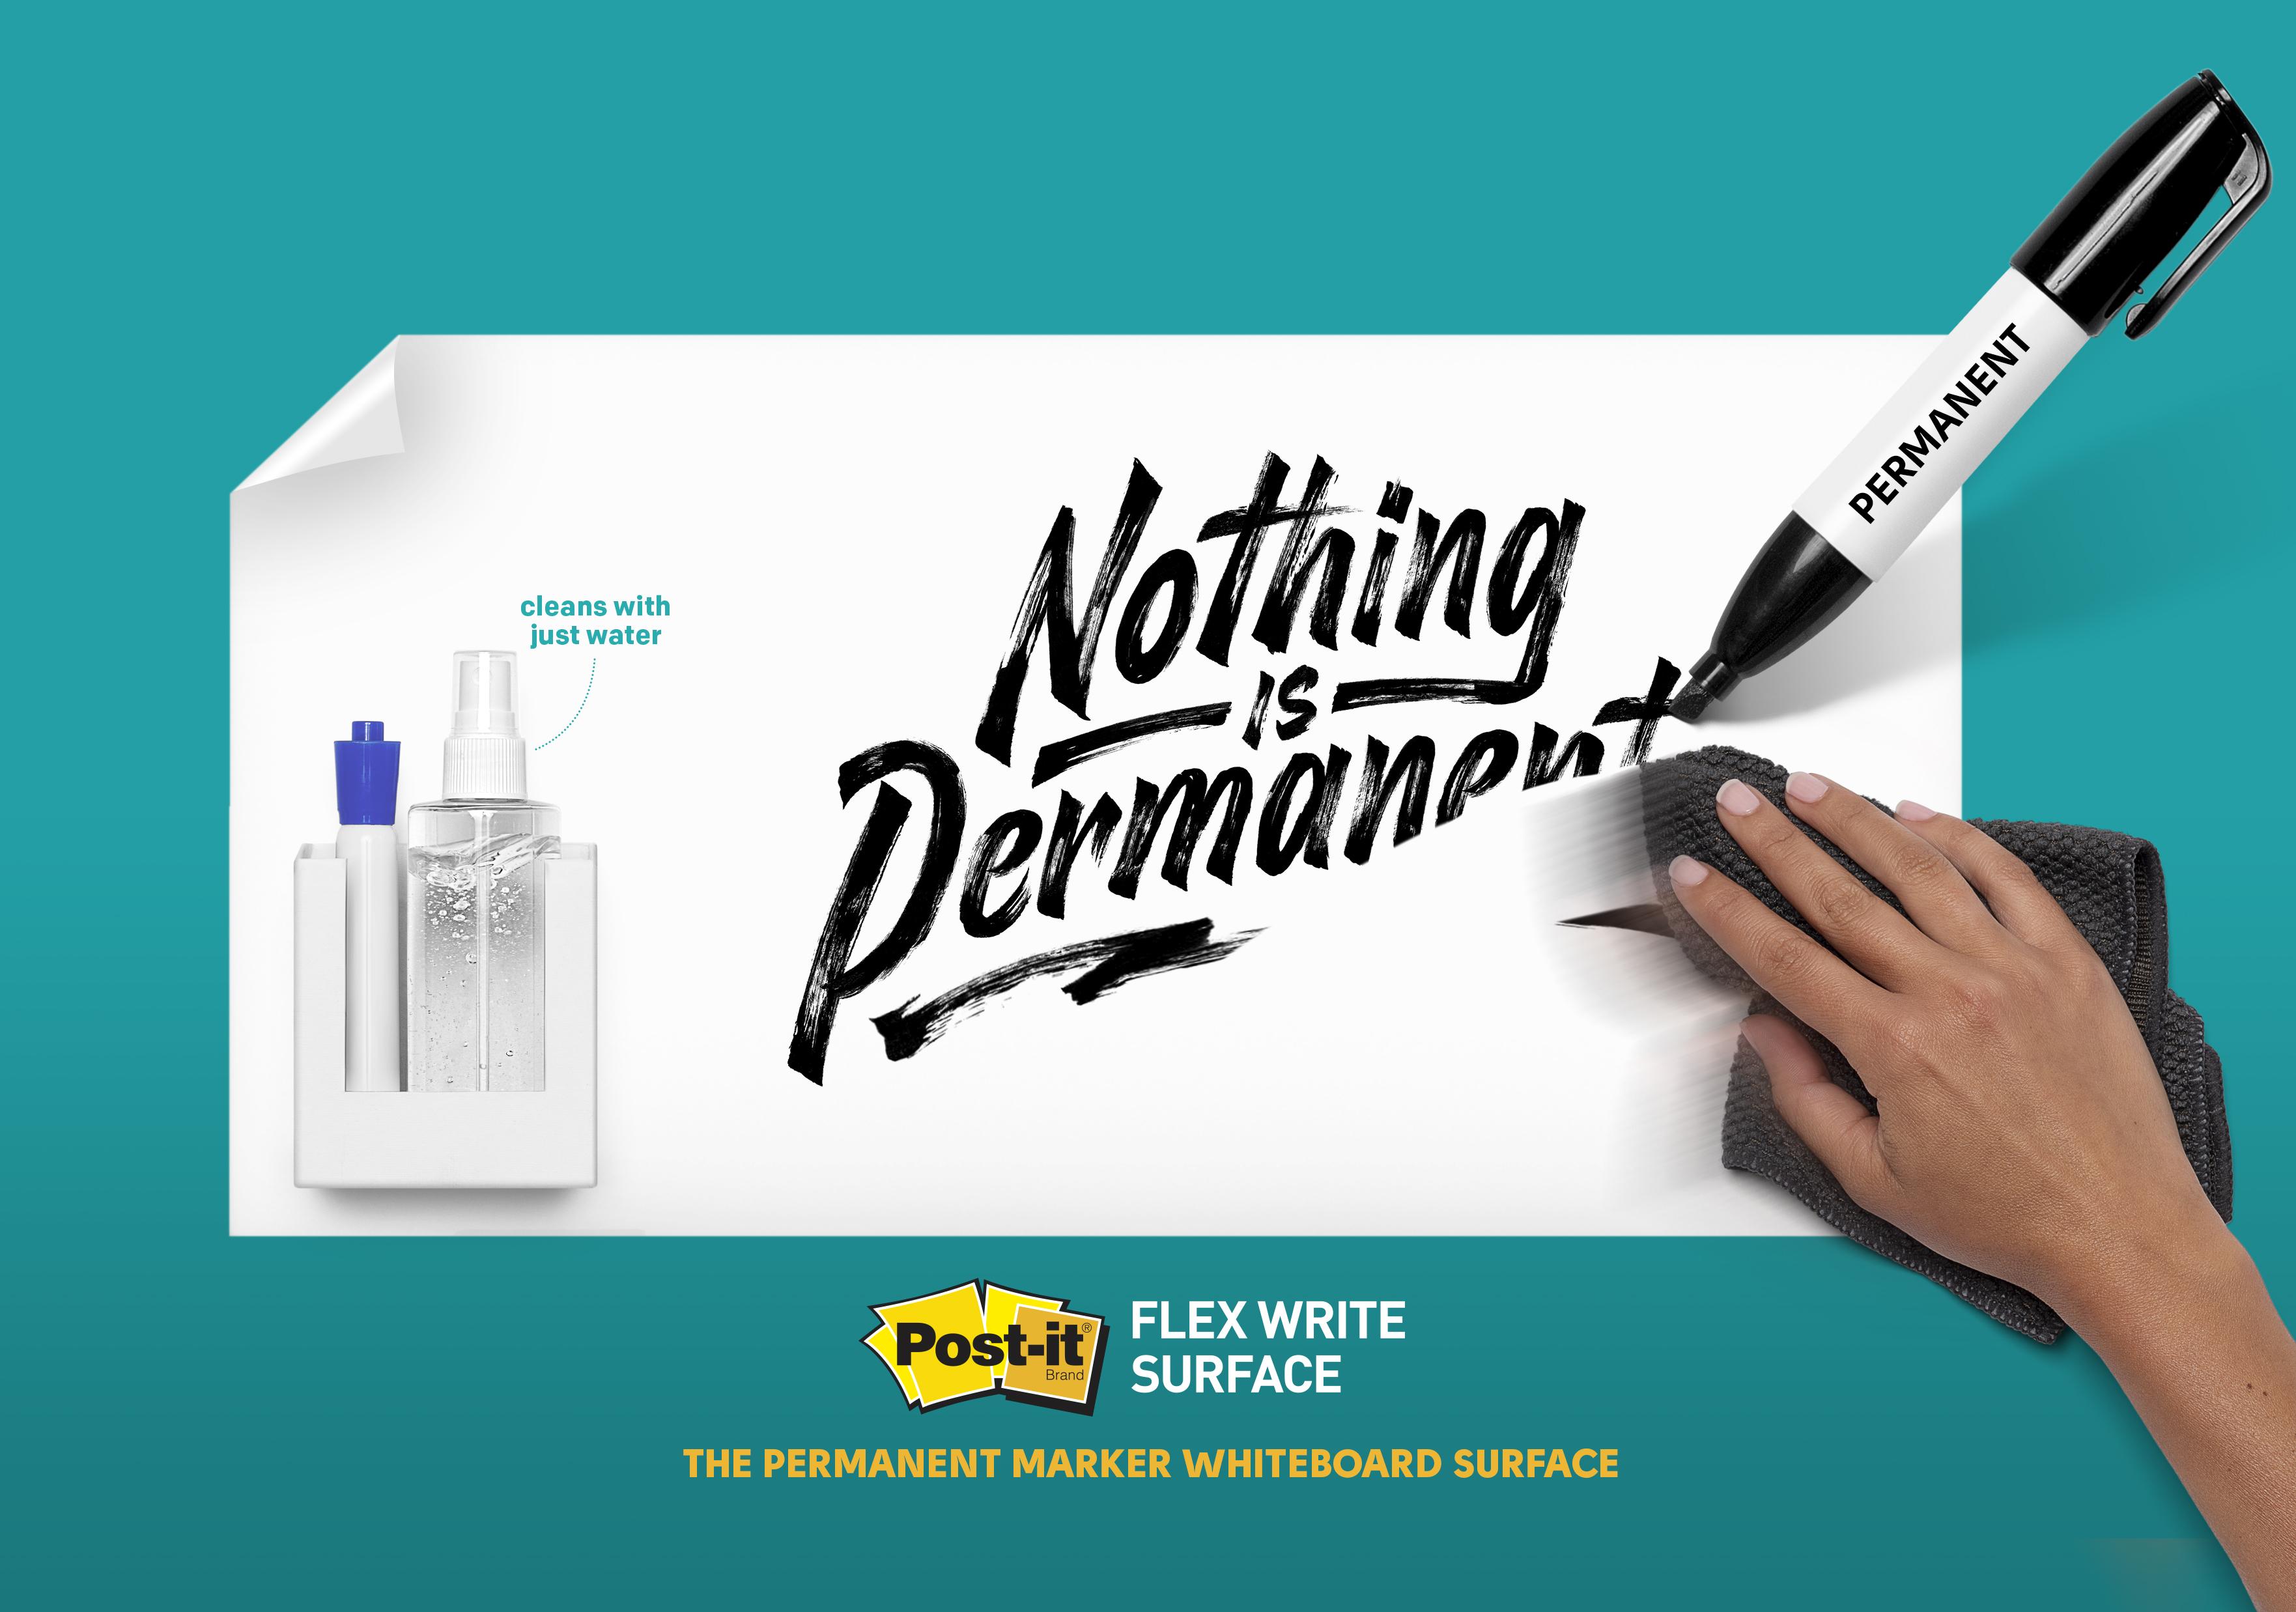 Post-it® Flex Write Surface